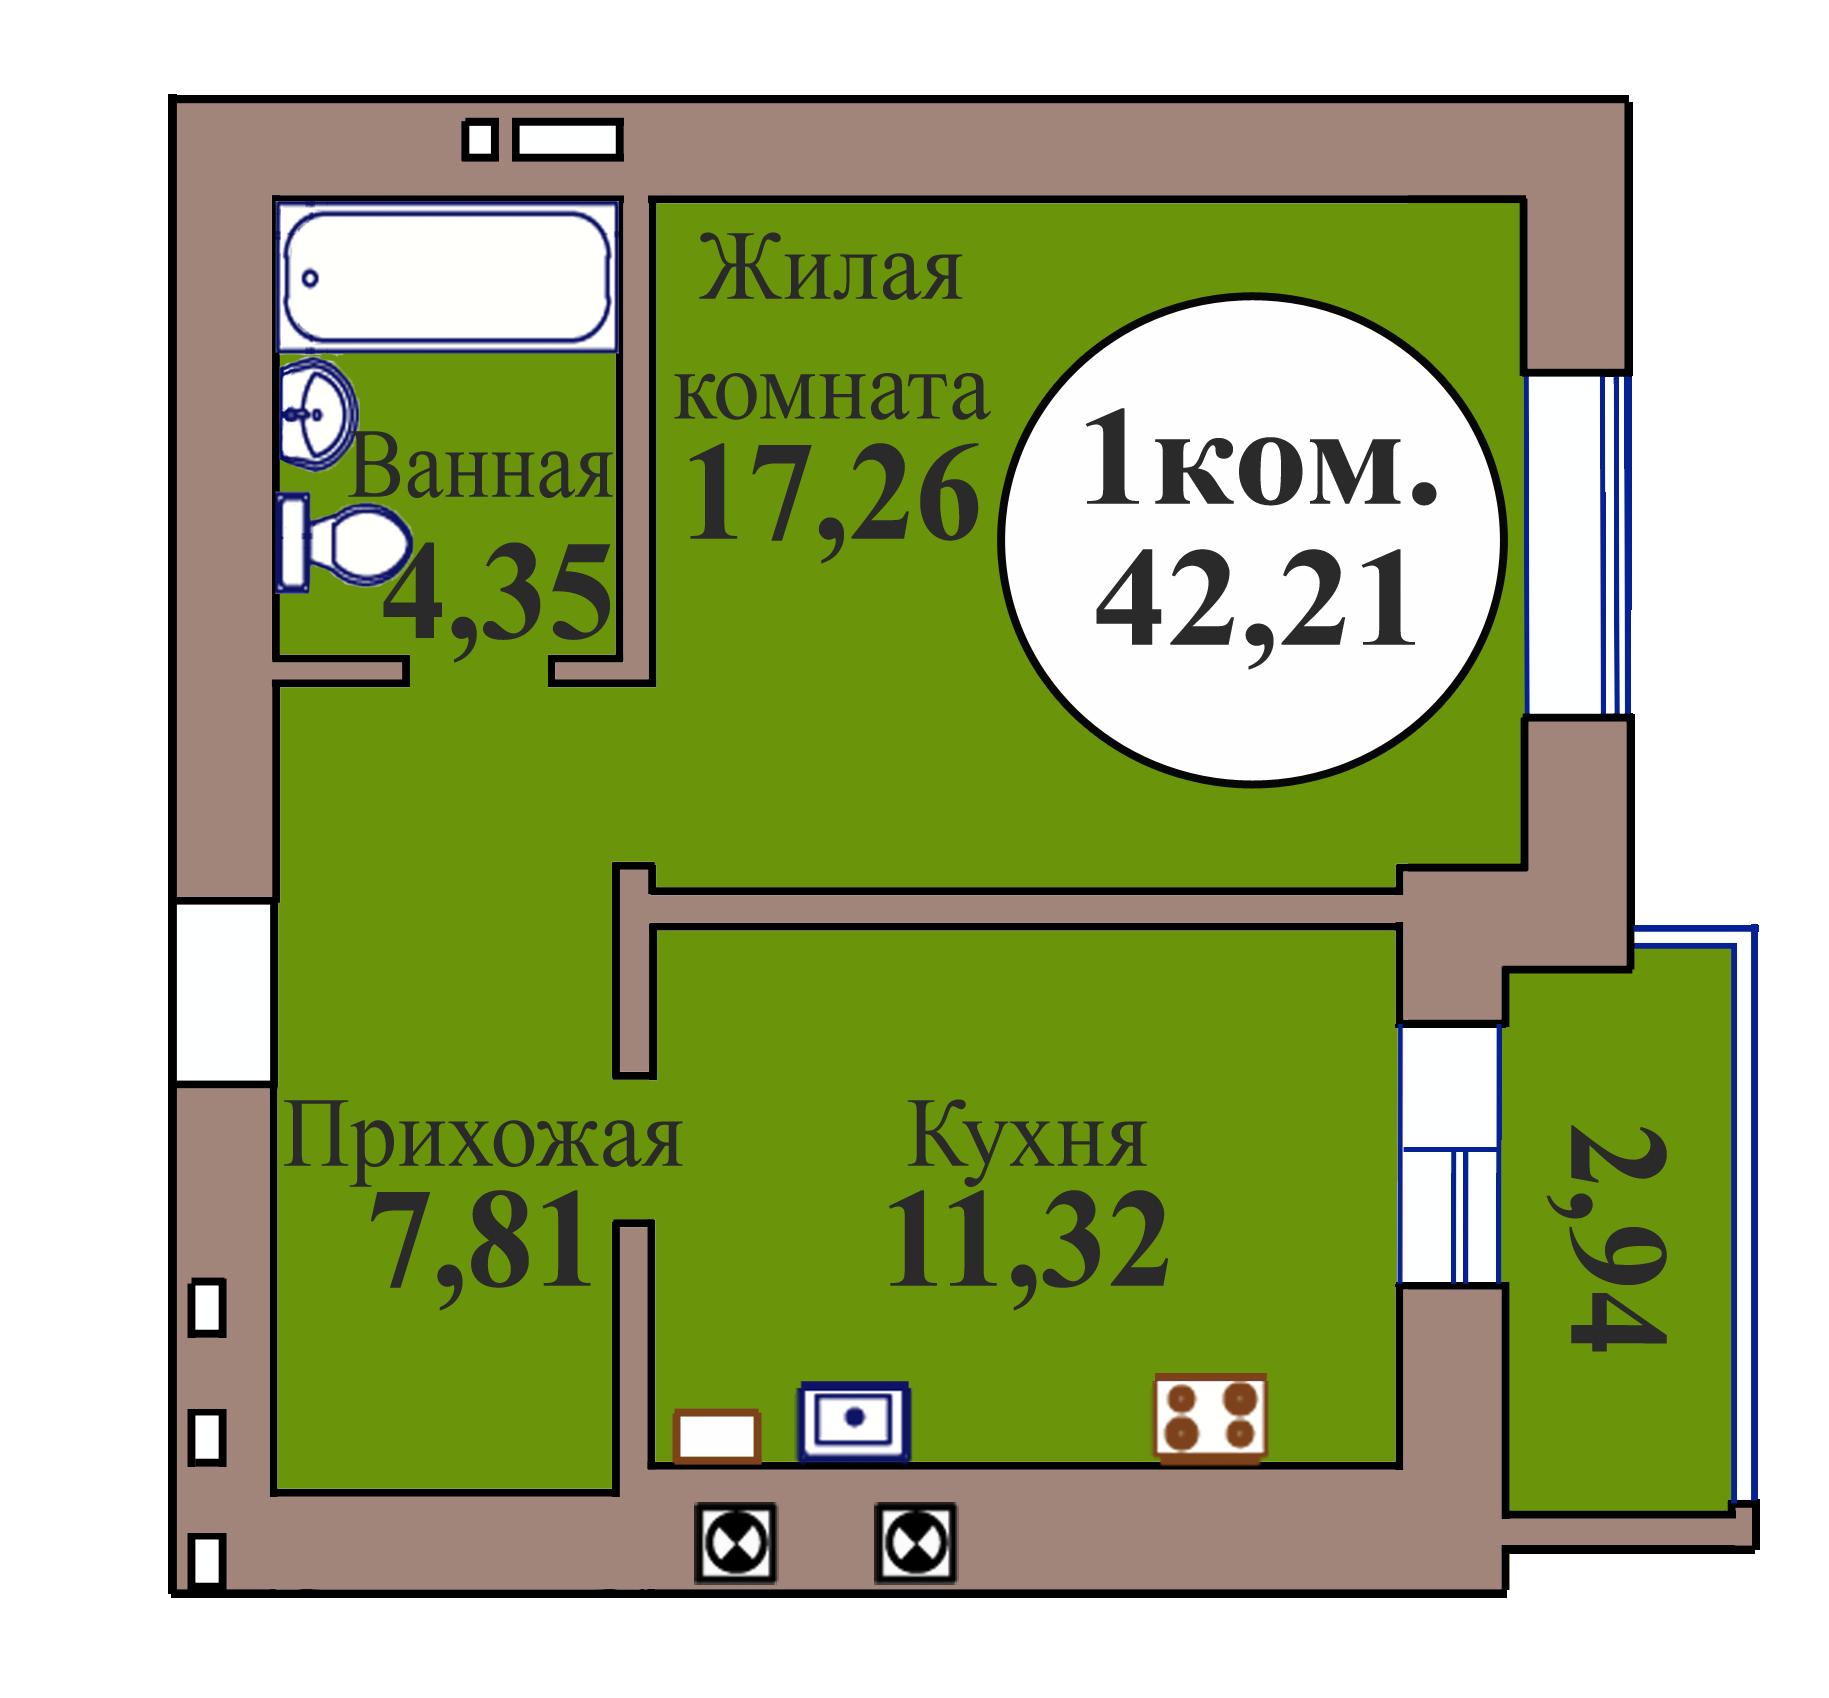 1-комн. кв. по ГП дом №3, МКР Васильково, кв. 165 в Калининграде